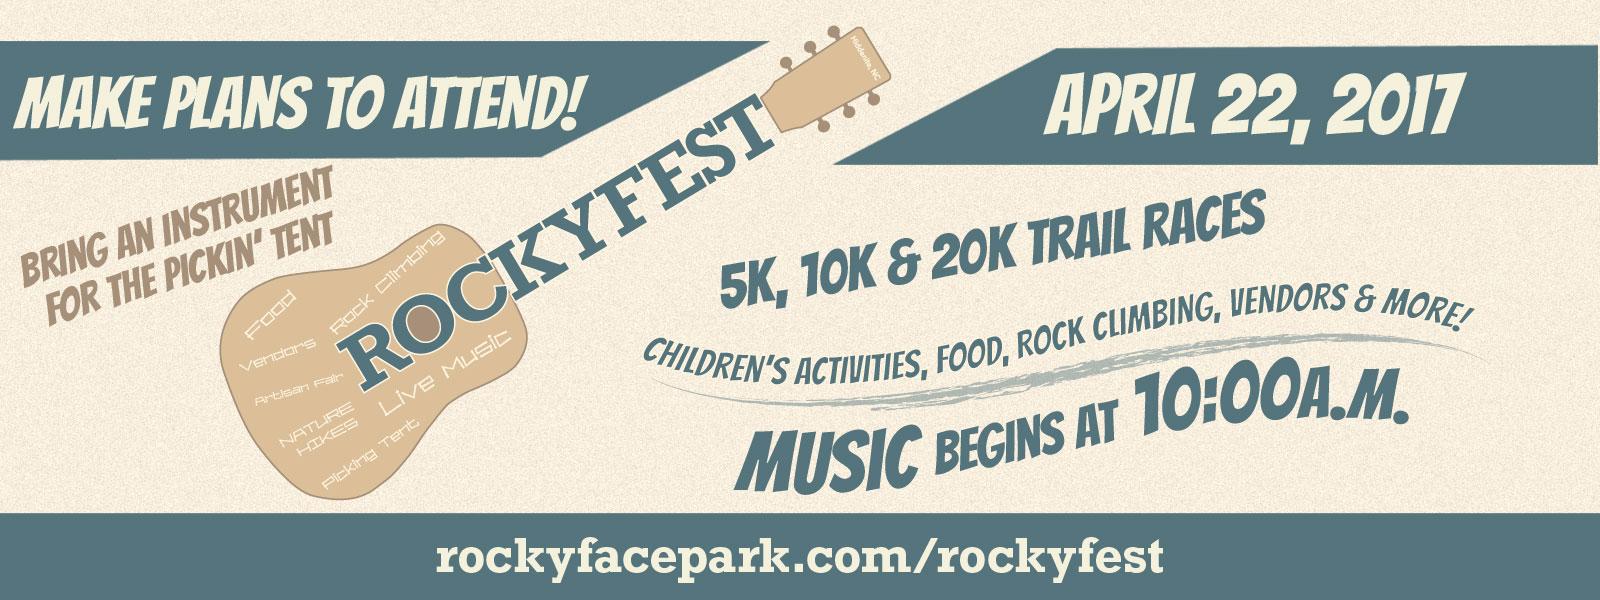 RockyFest 2017